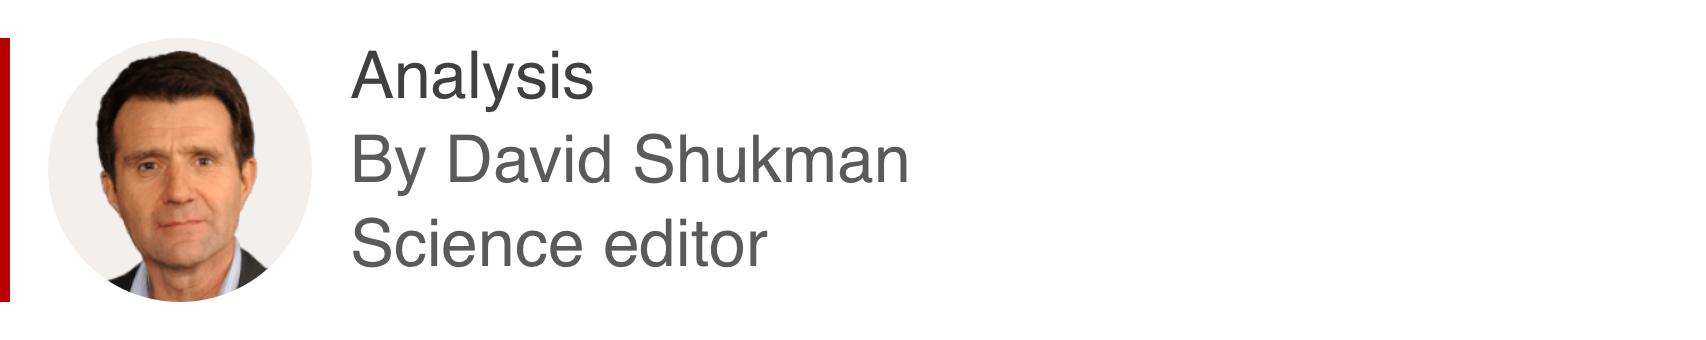 Analysis box by David Shukman, science editor